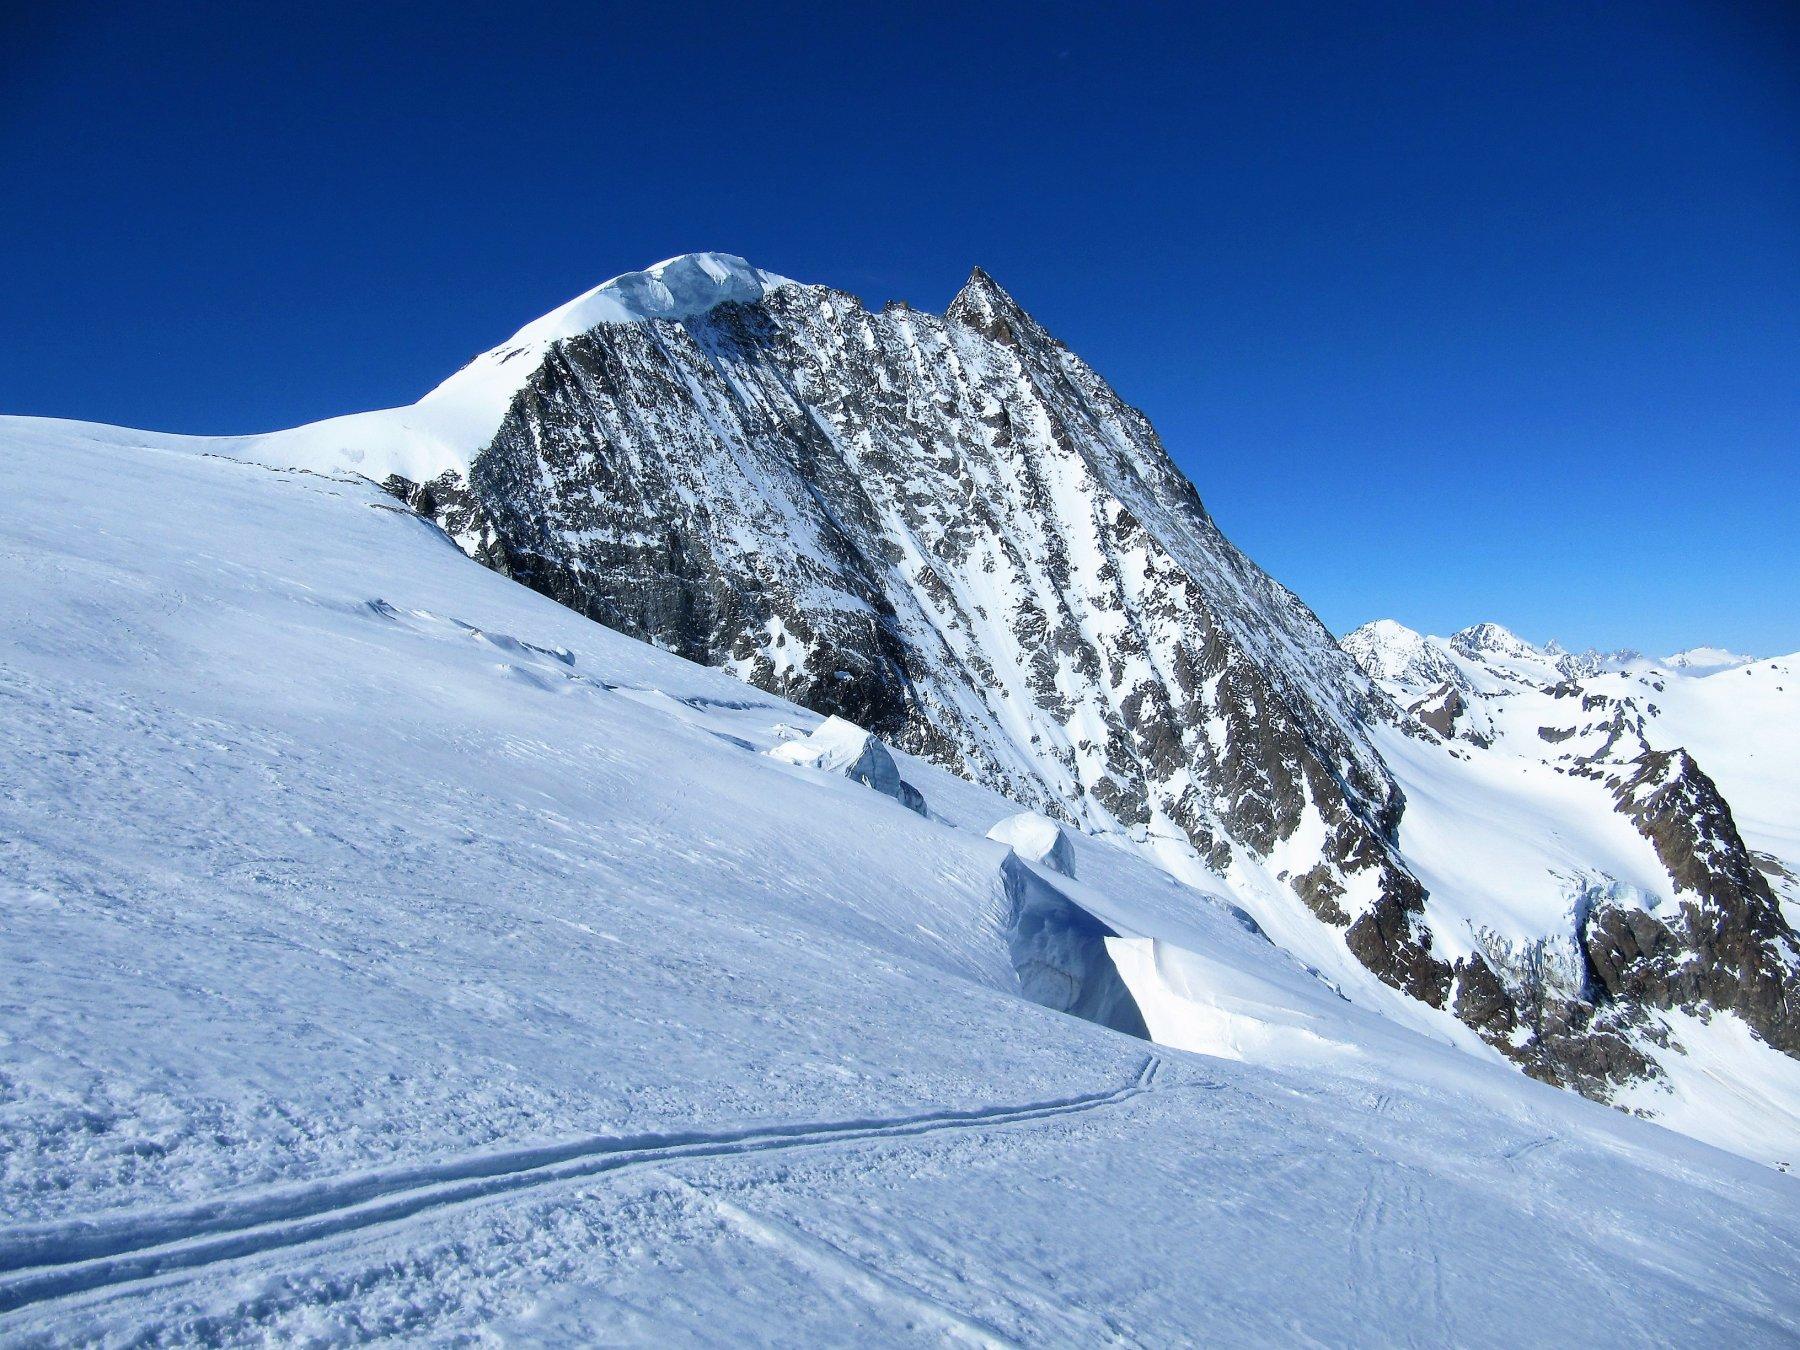 Mont Blanc de Cheillon scendendo verso la Cabane de Dix